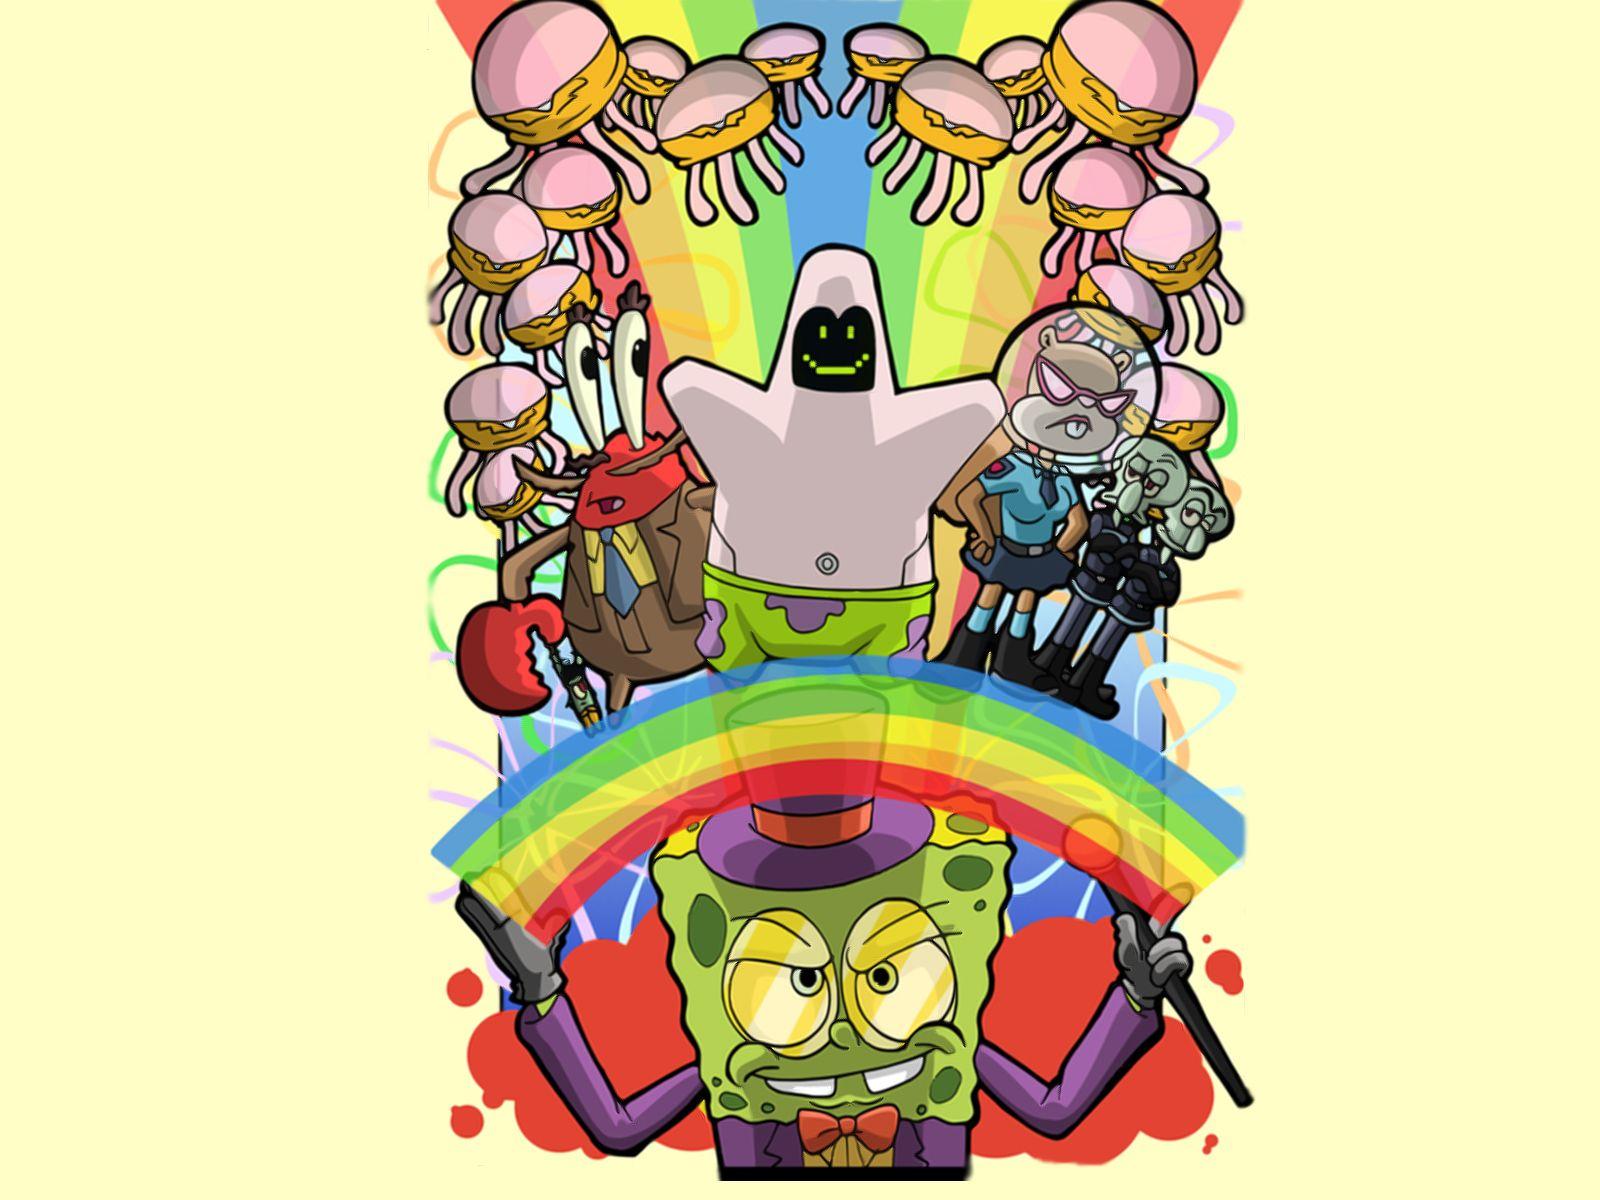 Spongebob as SuperJail | [ adult swim ] | Pinterest